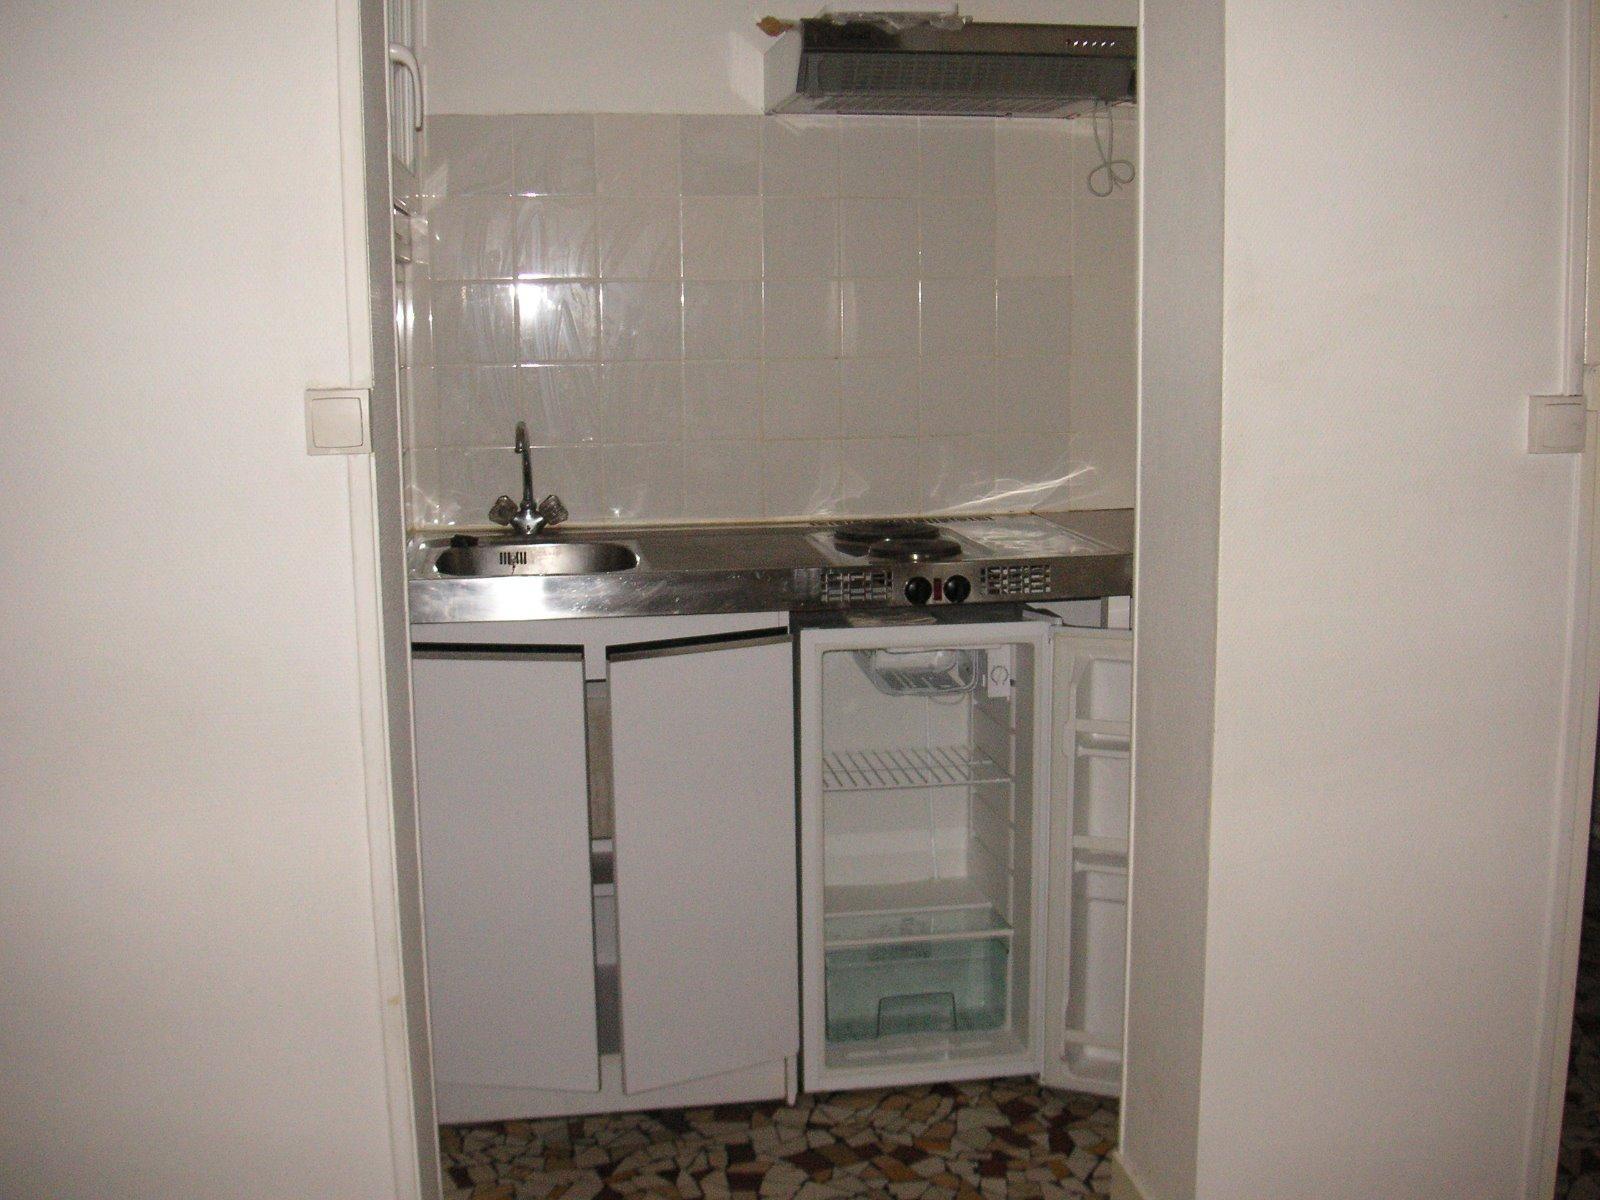 Location a louer t1 rue d 39 ornano for Appartement bordeaux ornano